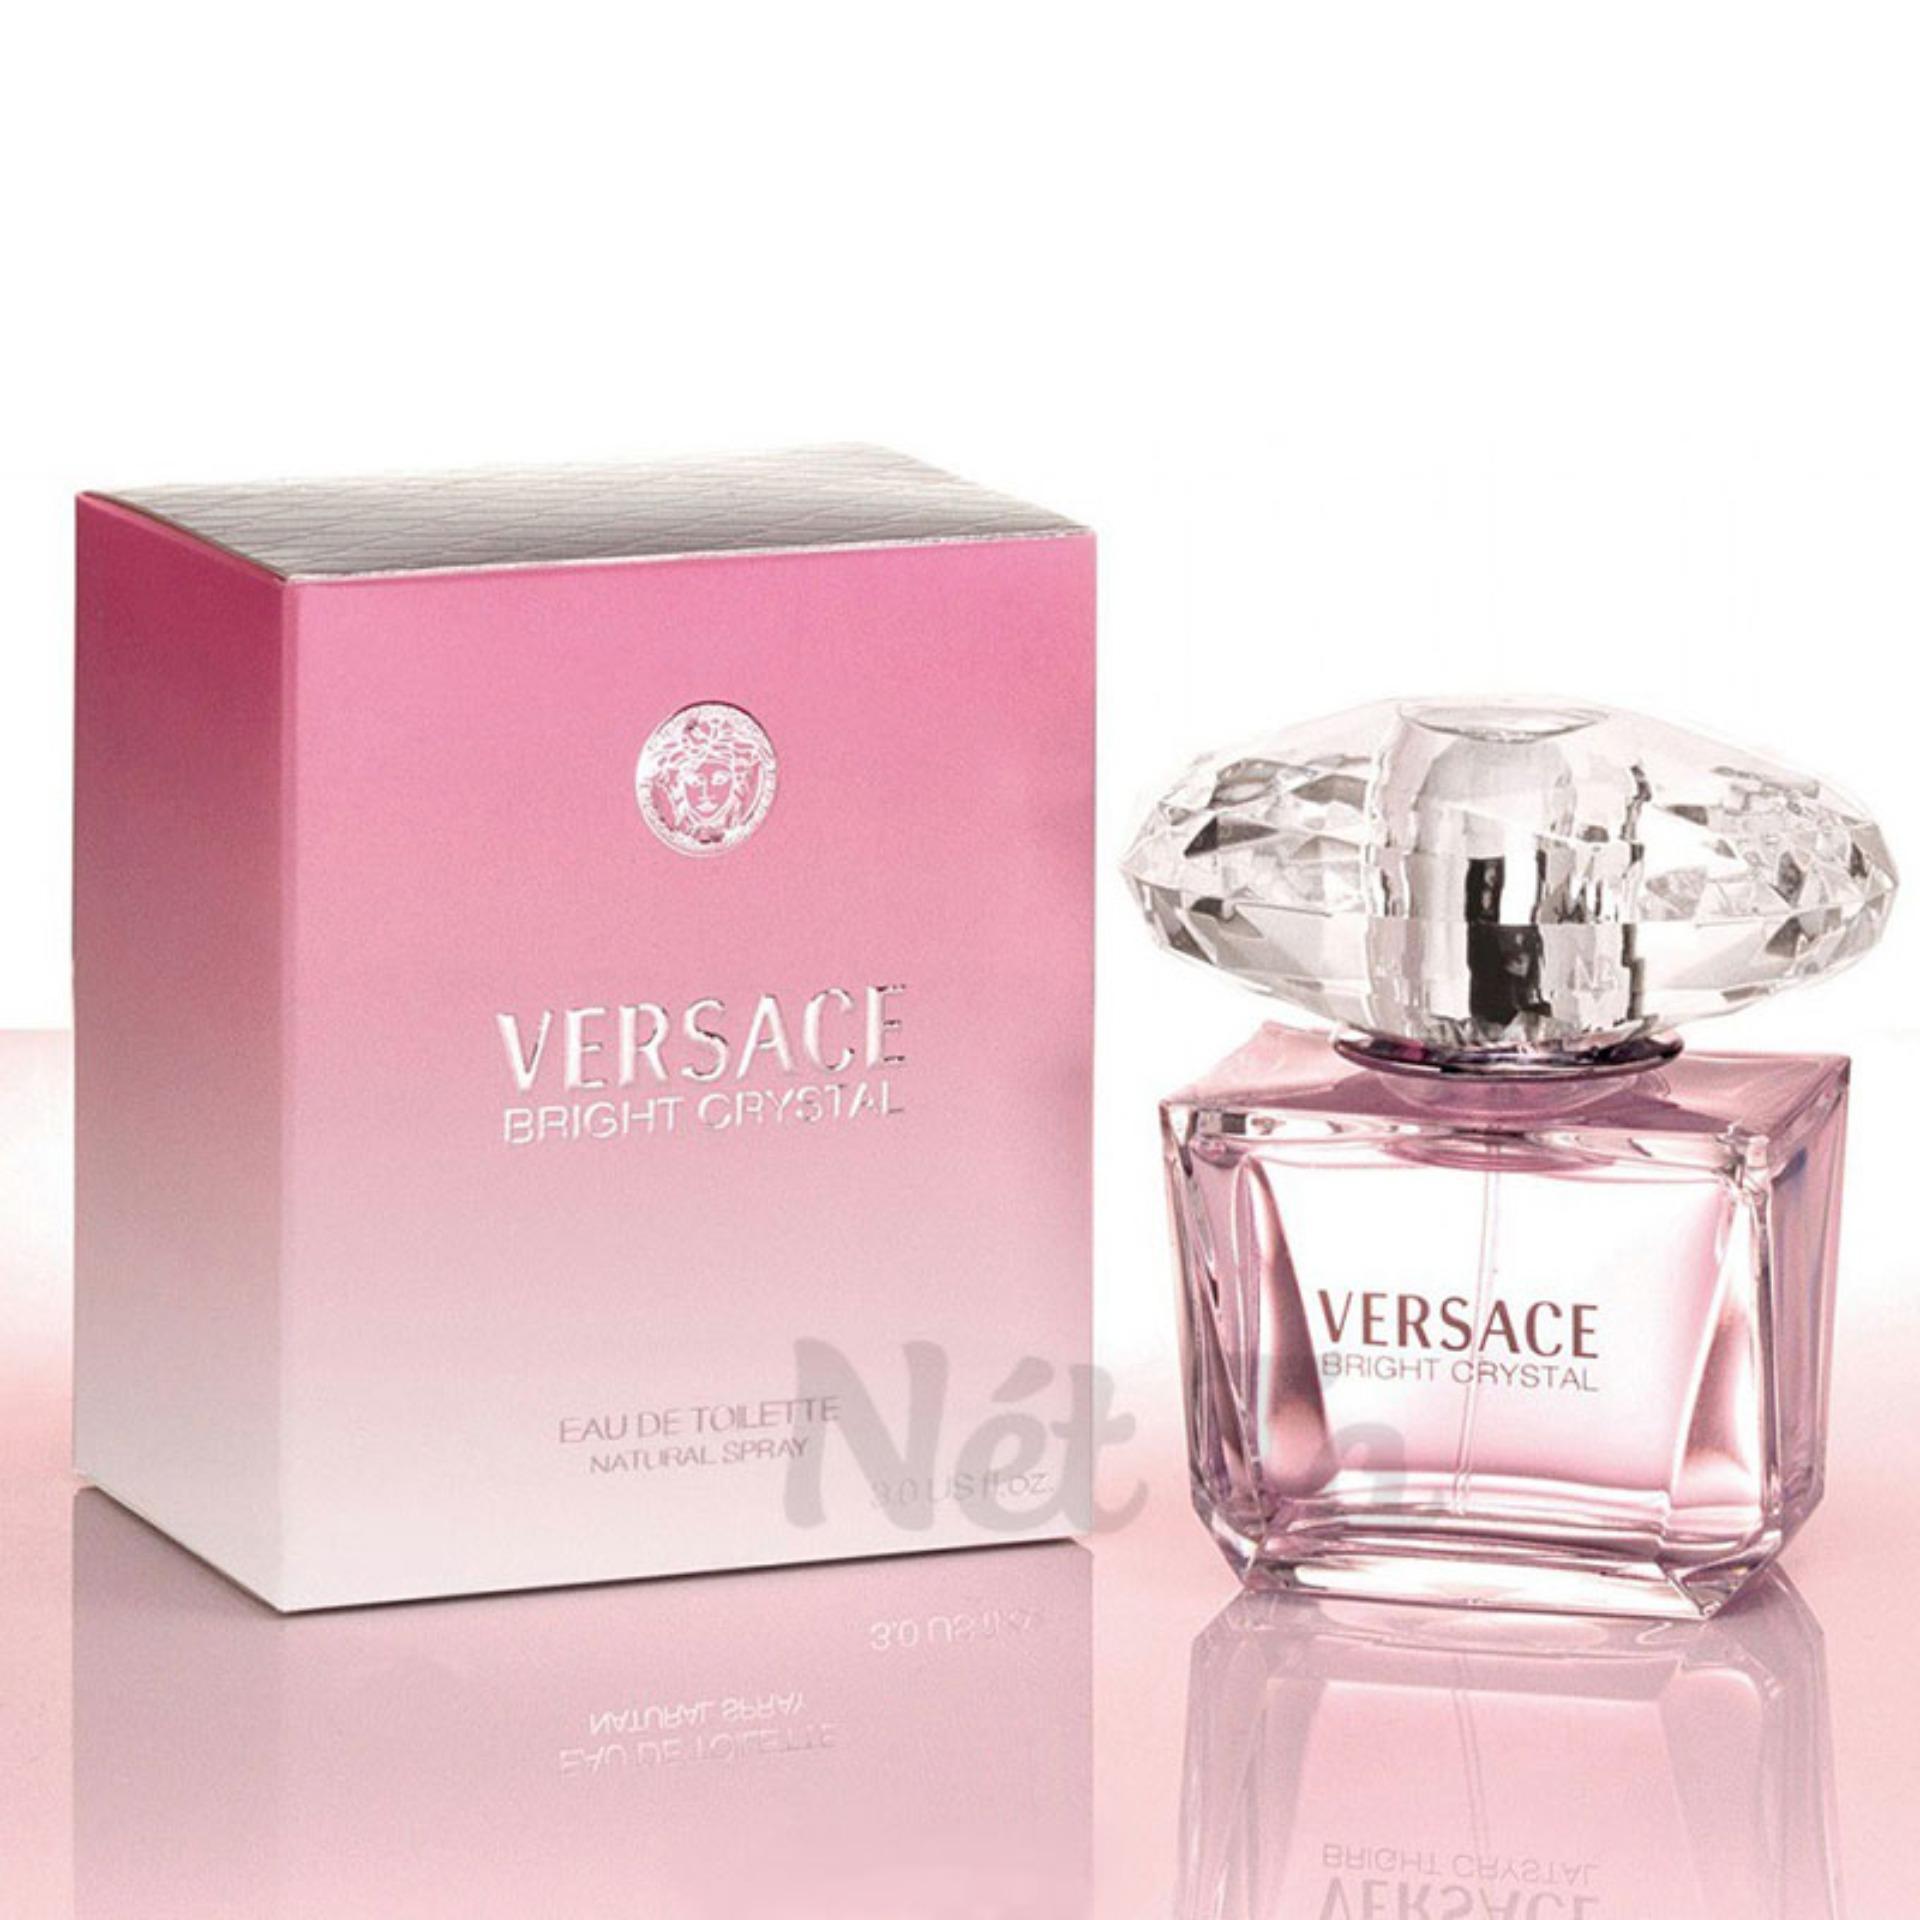 Nước hoa nữ Versace Bright Crystal - Eau De Toilette 5ml